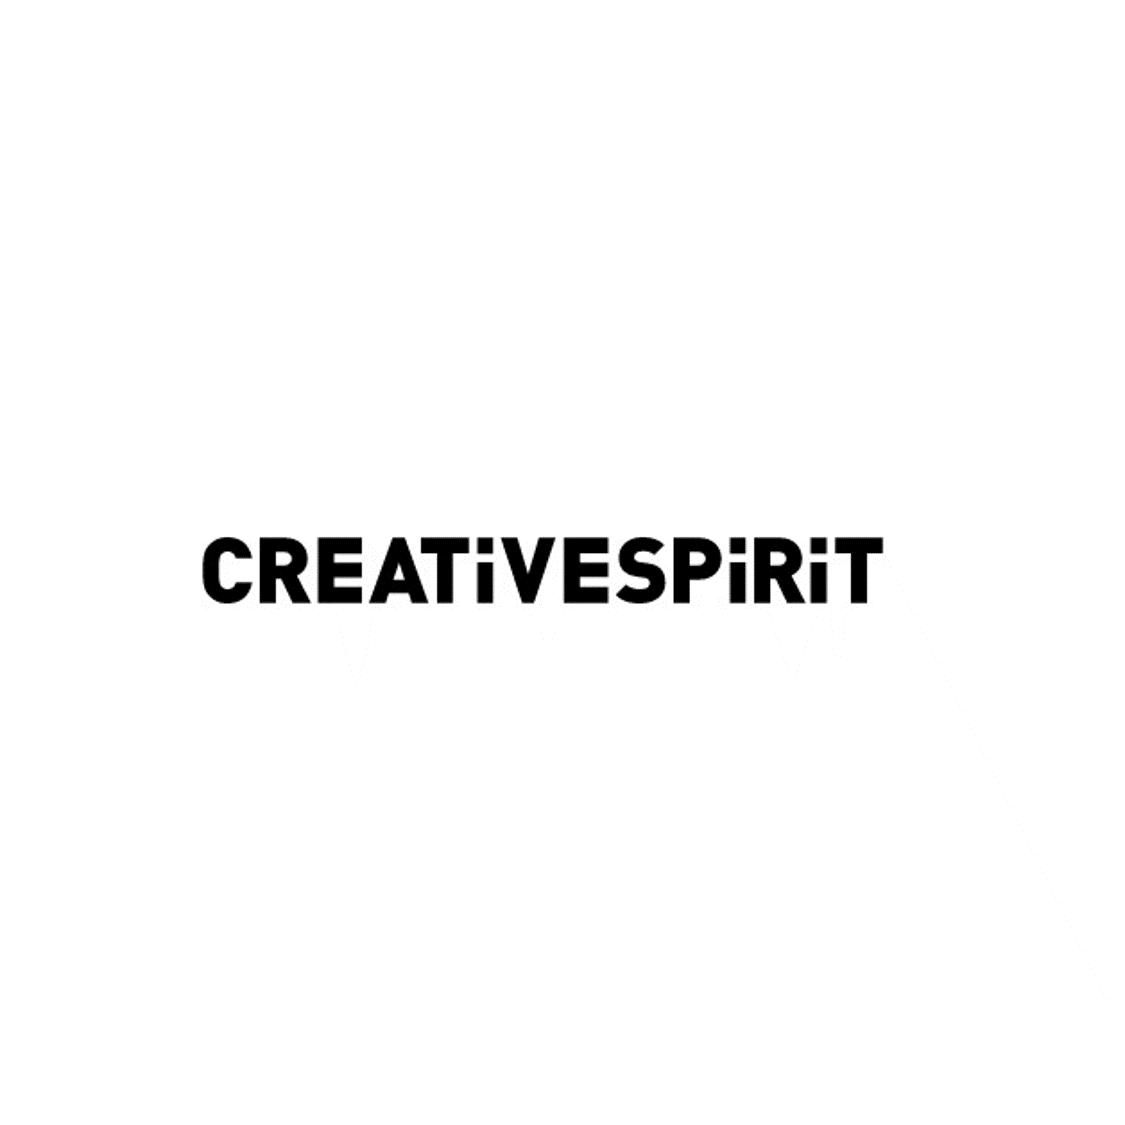 creative_spirit_dj_m4t